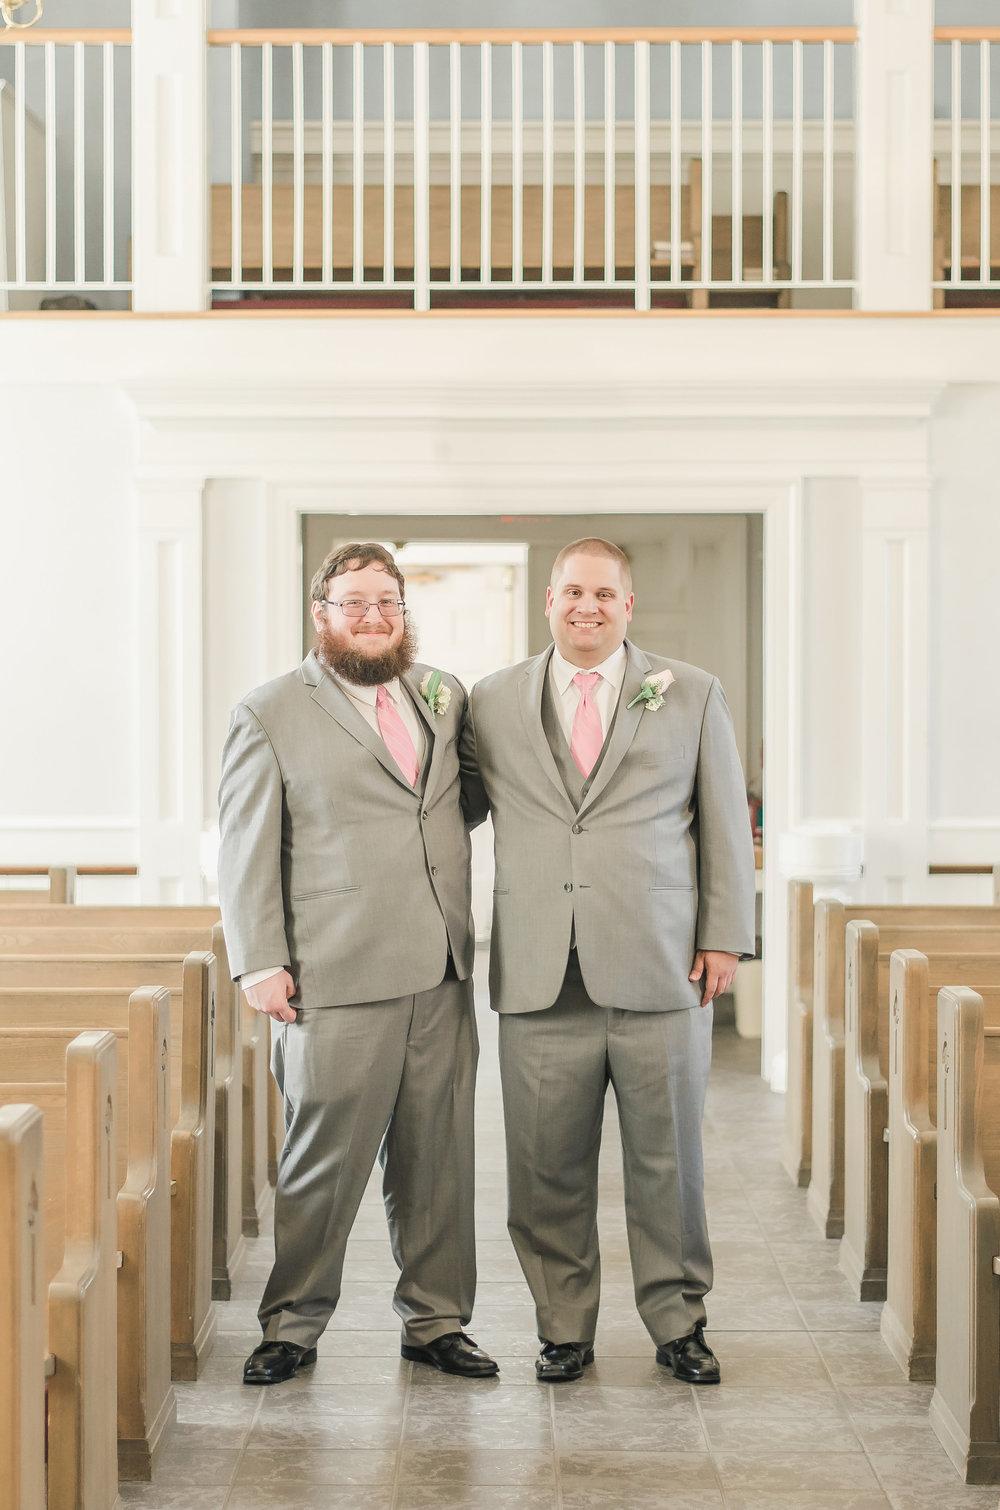 Griffith-Baltimore-Maryland-Wedding-Photographer-Manda Weaver-182.jpg